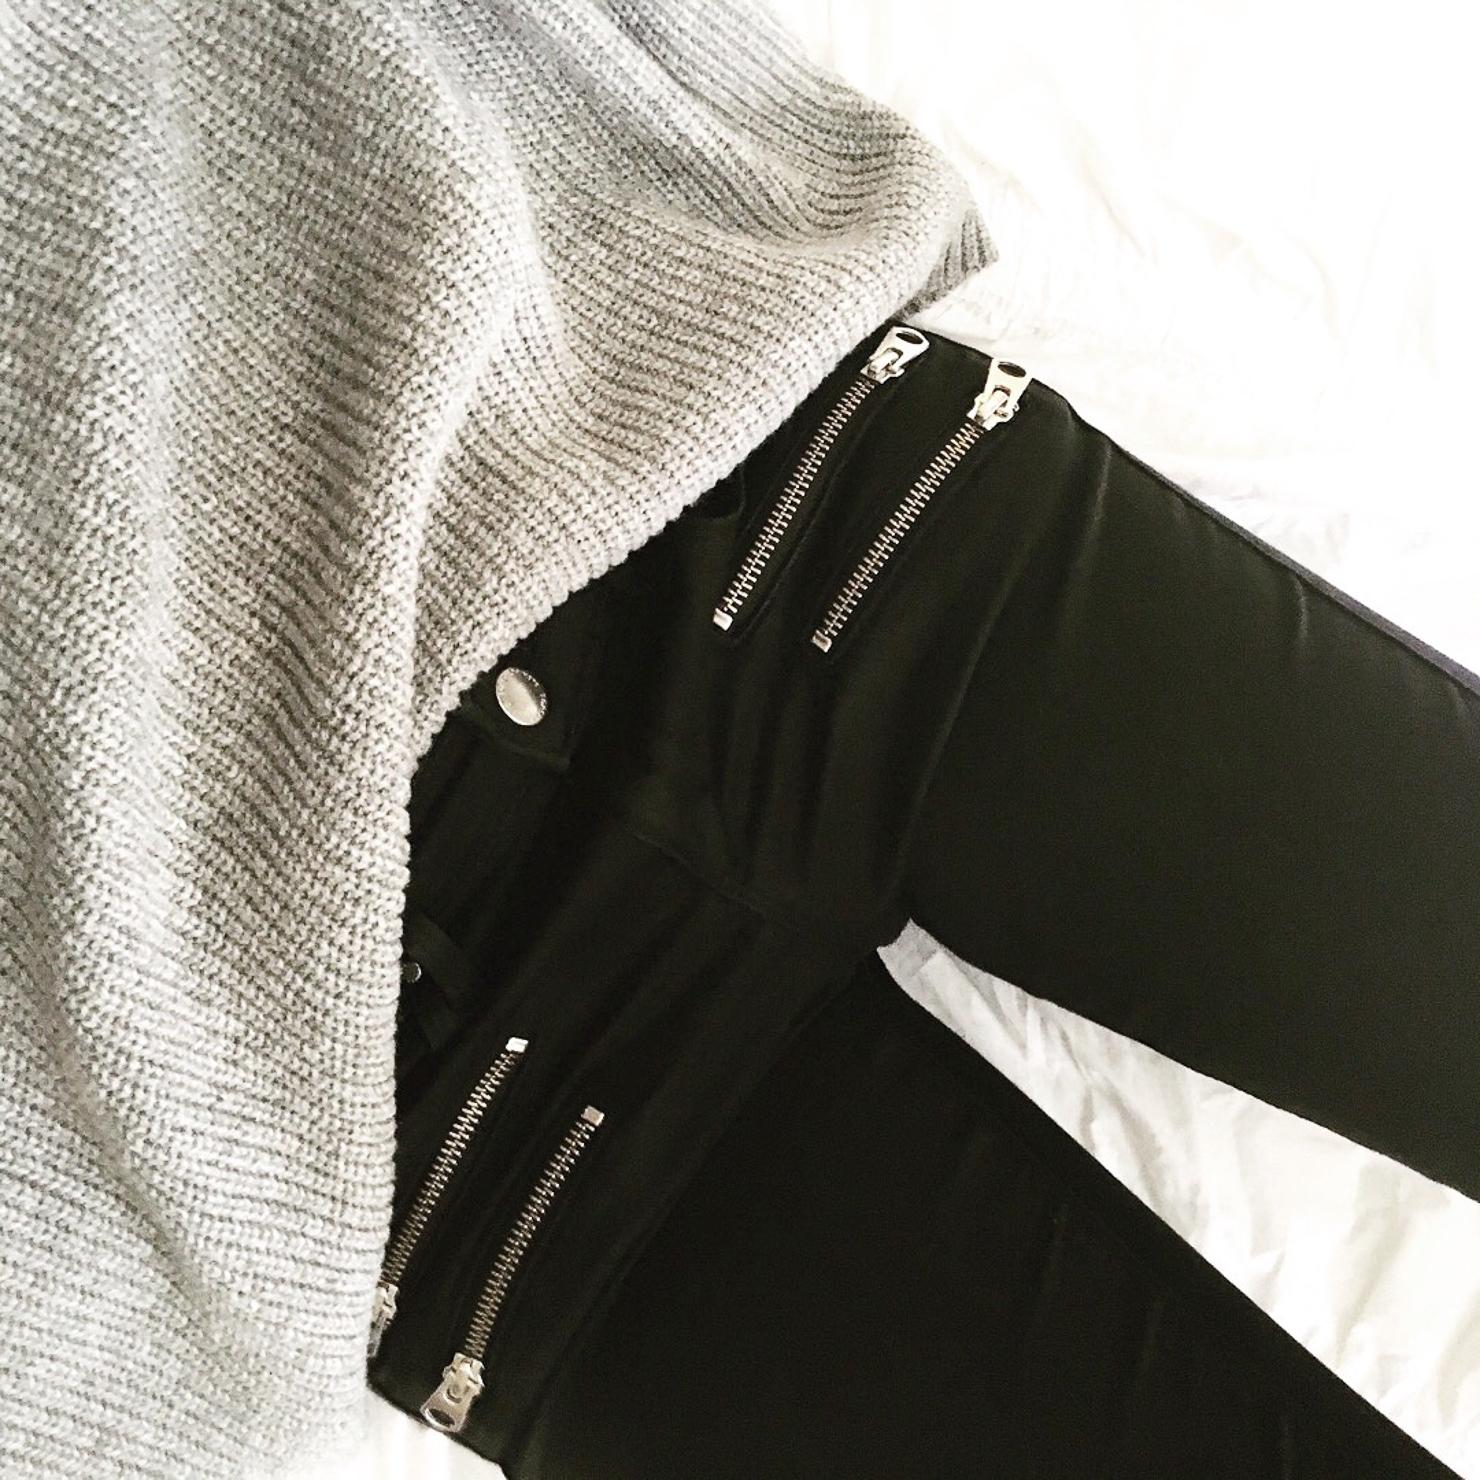 black-skinny-jeans-with-zips-instagram